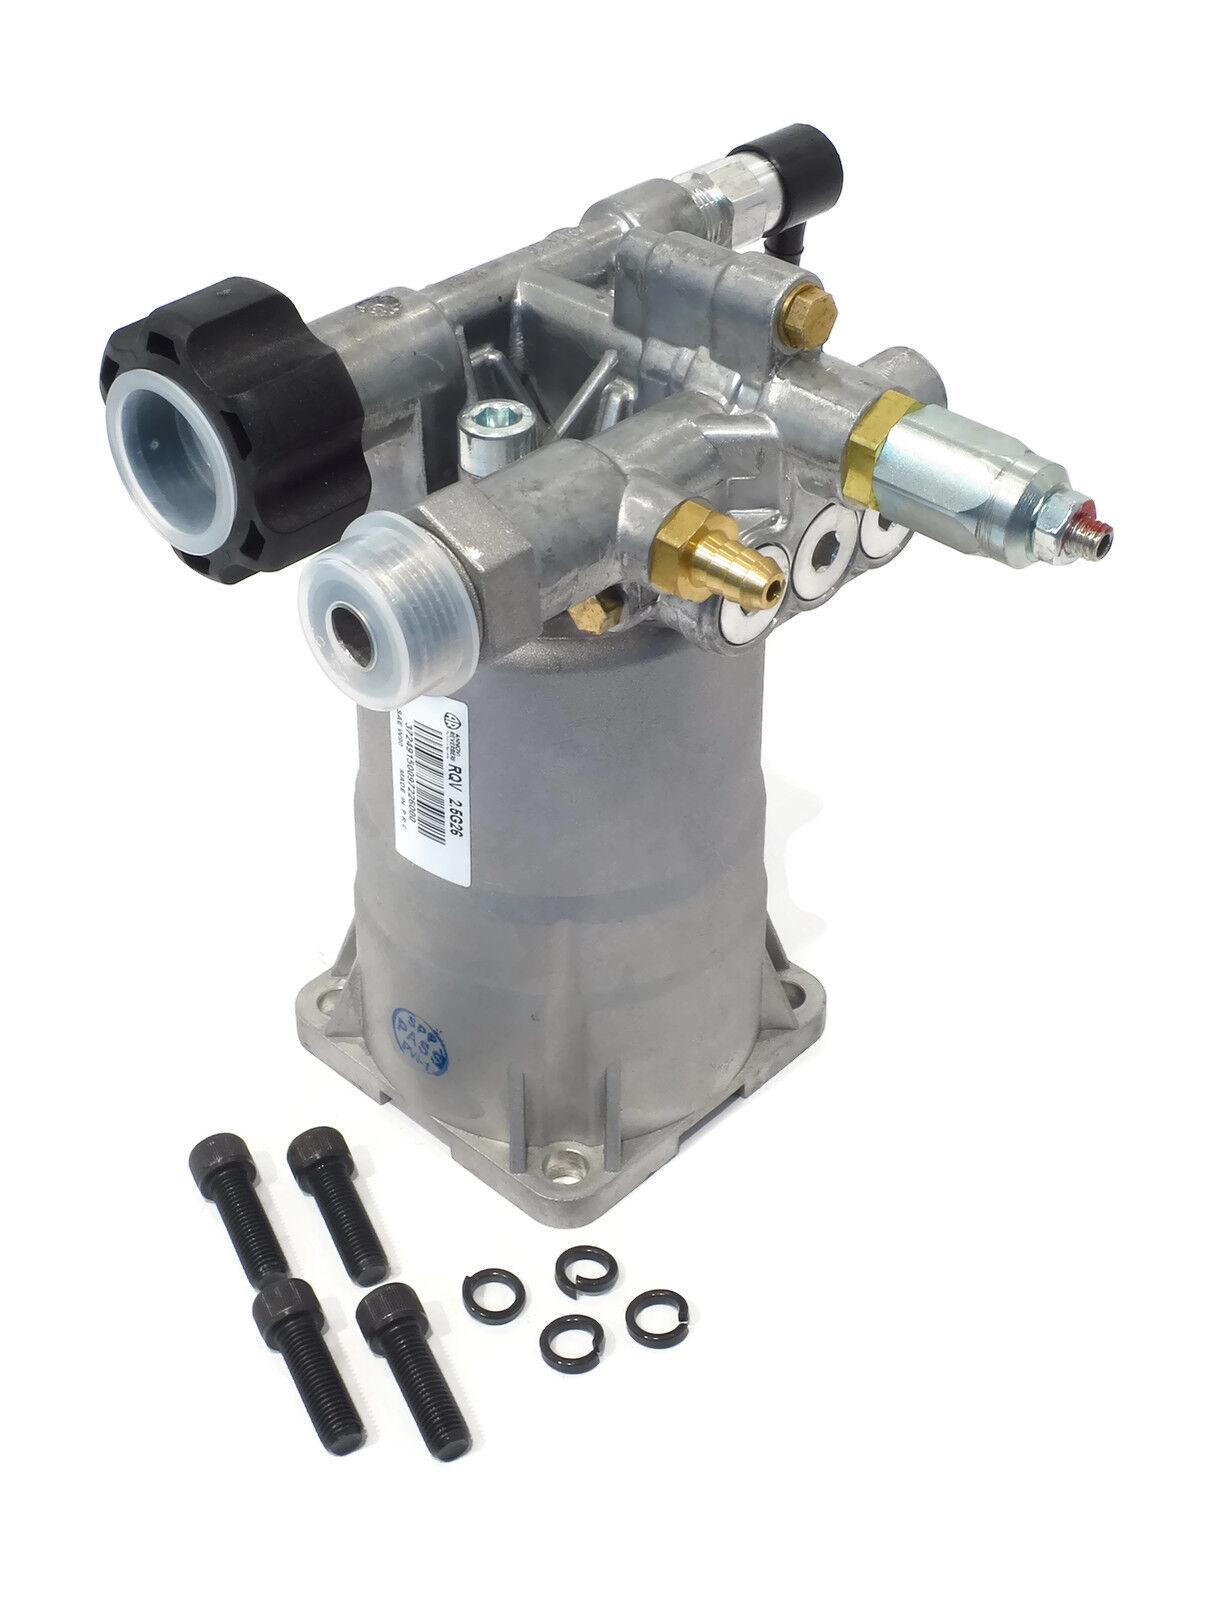 Nuevo 2600 PSI Hidrolimpiadora Bomba De Agua Campbell Hausfeld 3DX 2.9 3DX29GSI